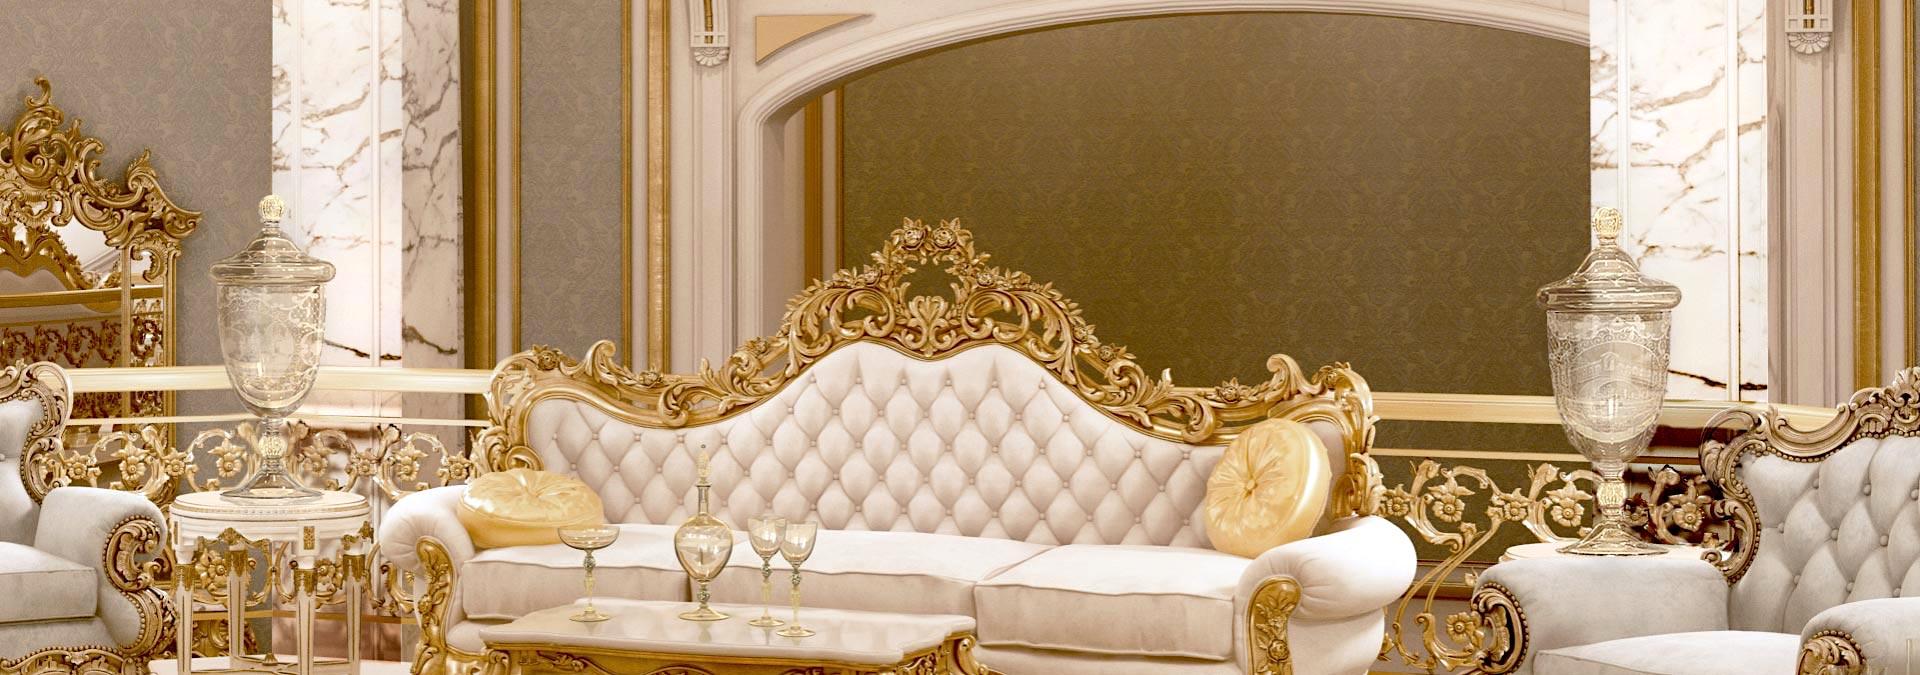 Murano Glass Luxury Decorative Objects